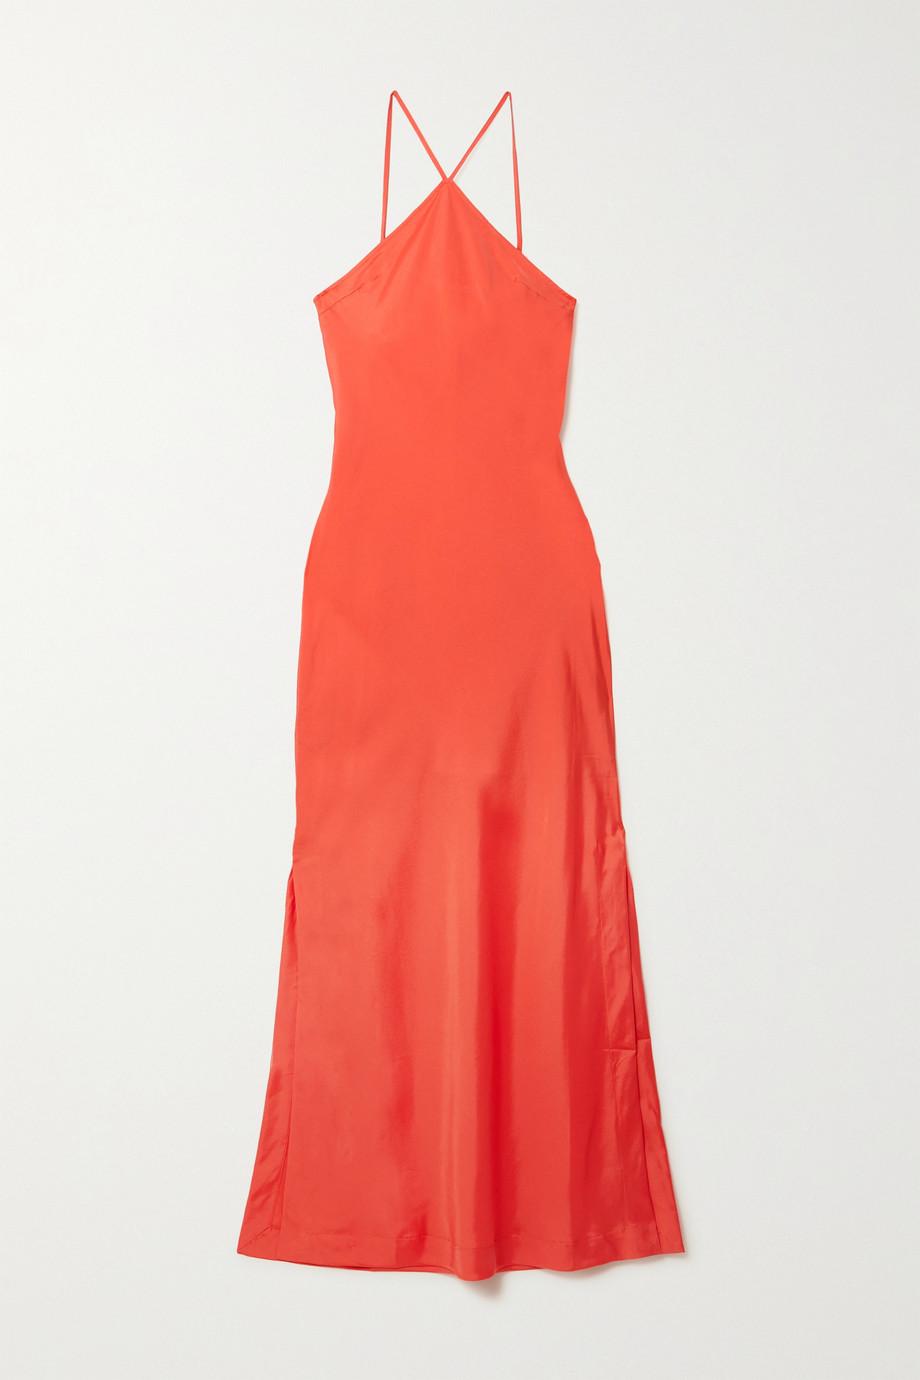 BONDI BORN + NET SUSTAIN Kate organic silk-blend maxi dress